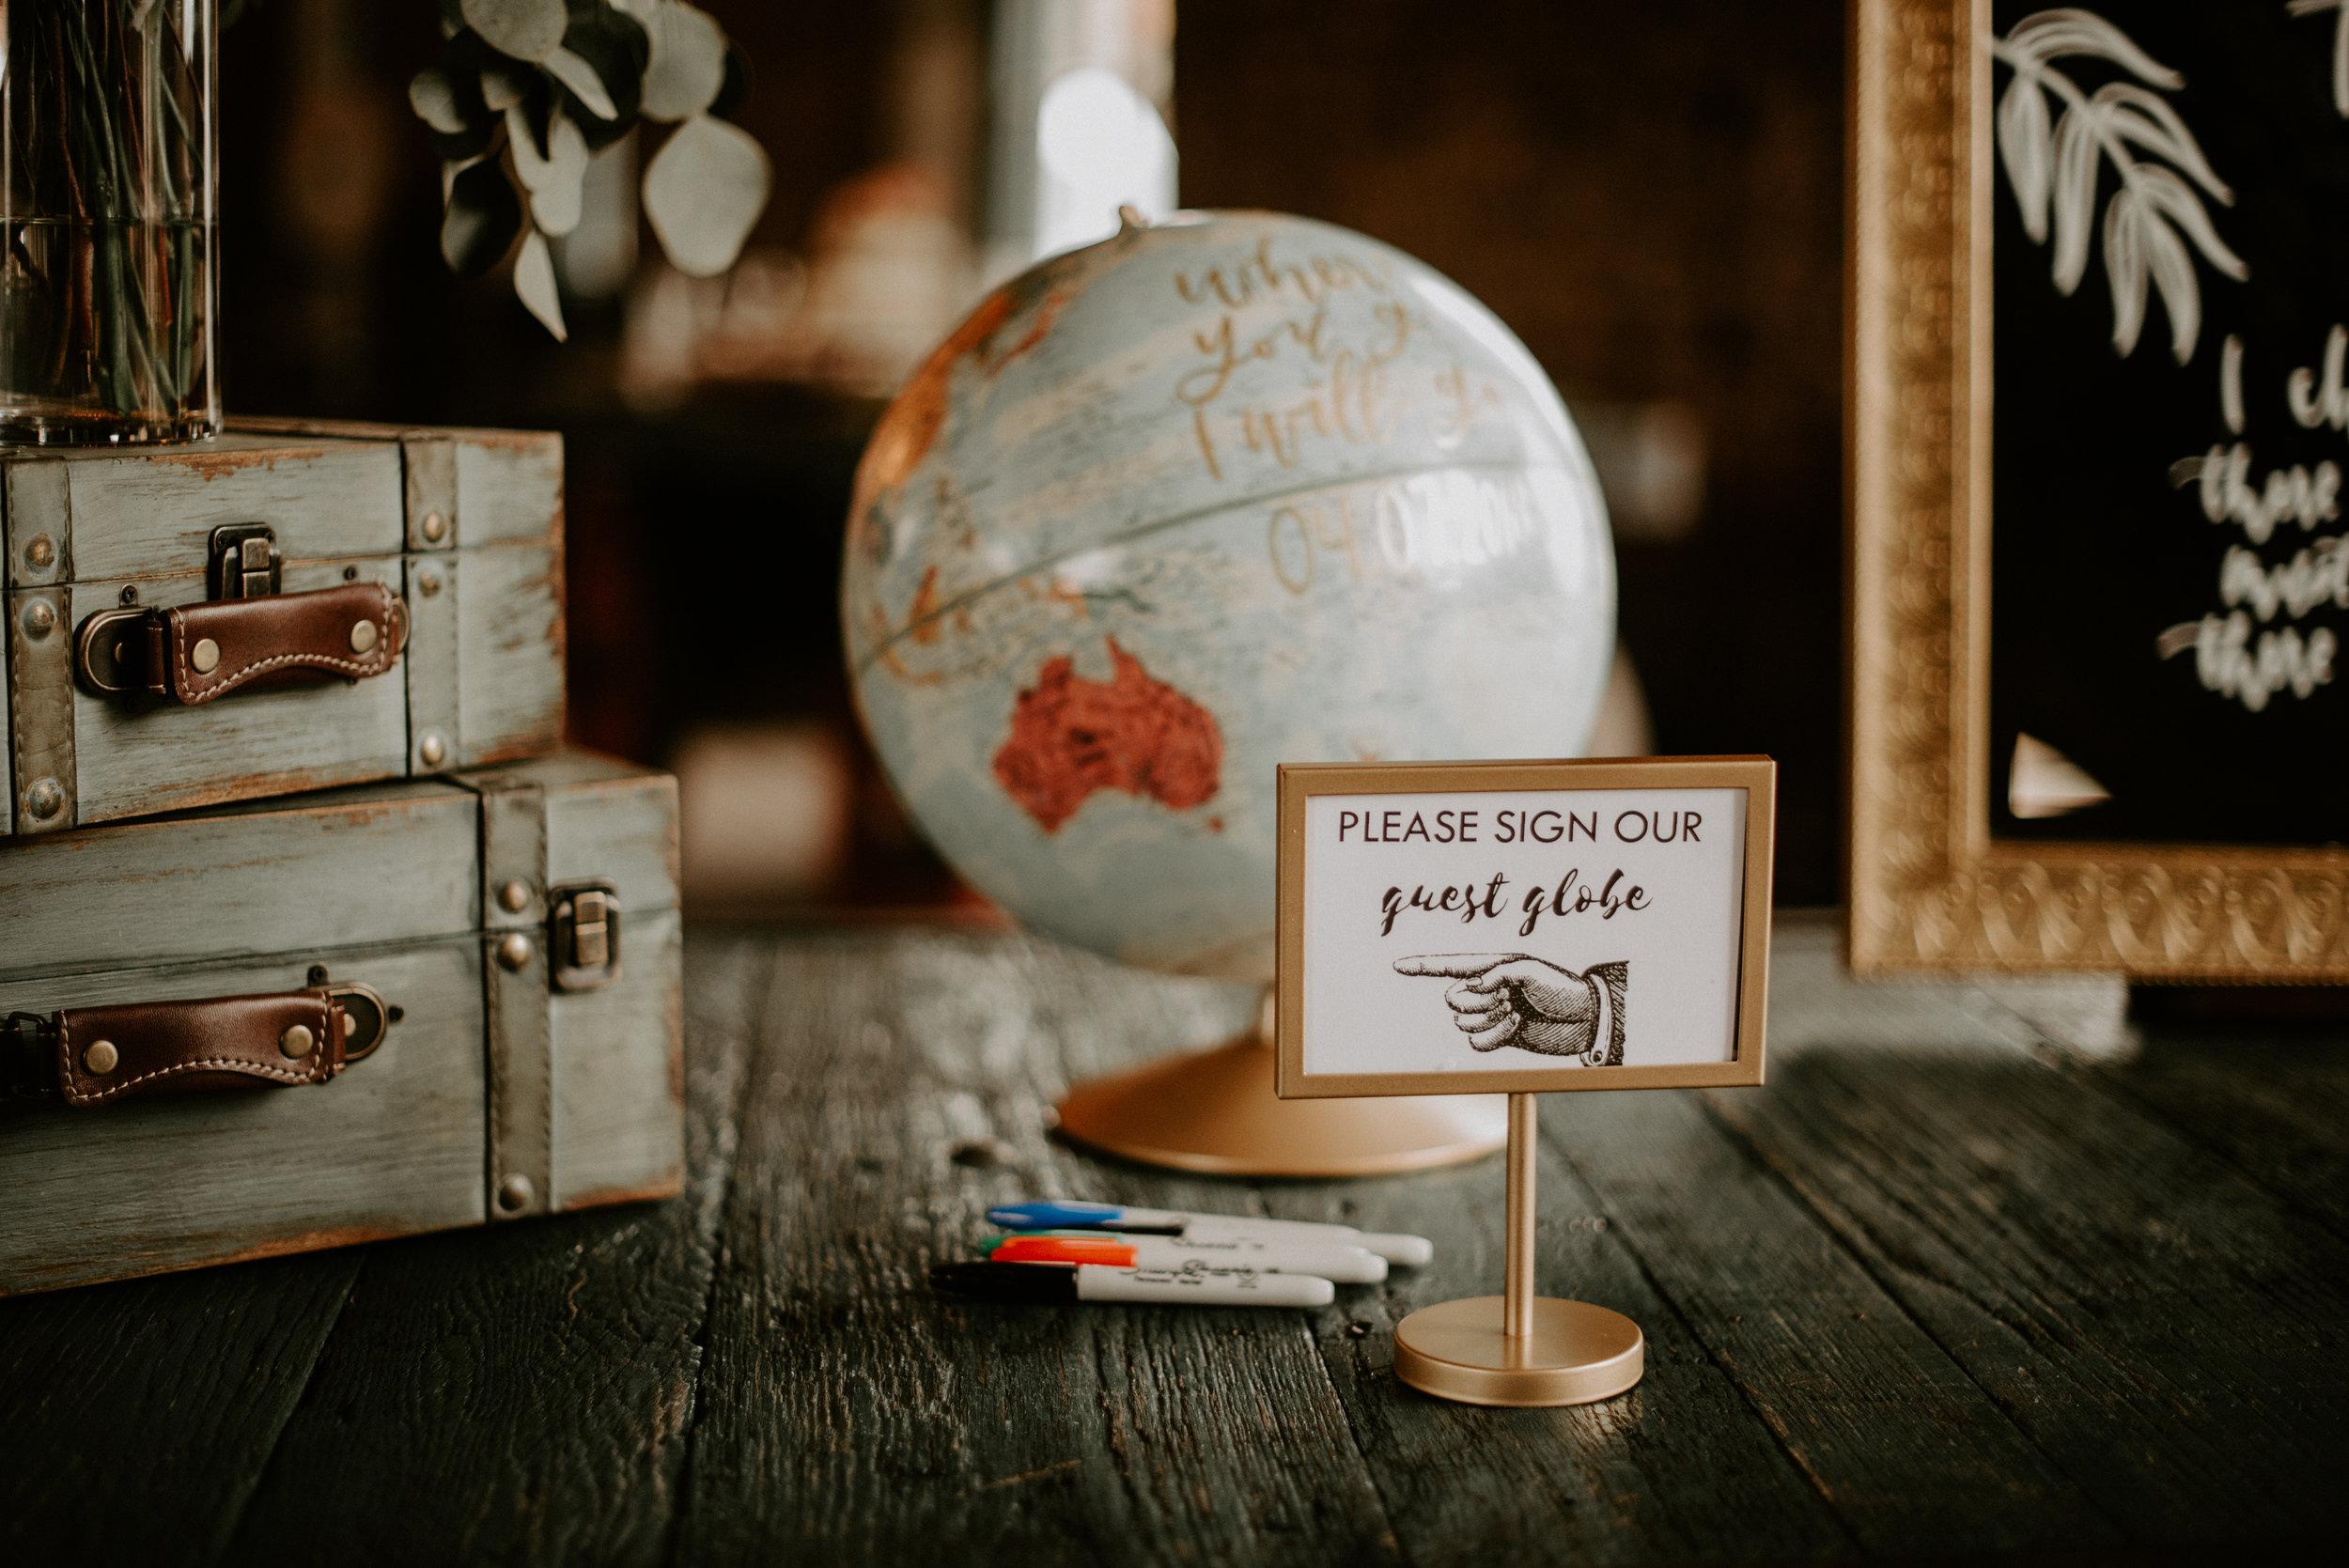 savannah-bridal-shop-andrea-and-mike-evergold-photography-georgia-state-railroad-museum-wedding-savannah-wedding-florist-savannah-wedding-planner-25.jpg